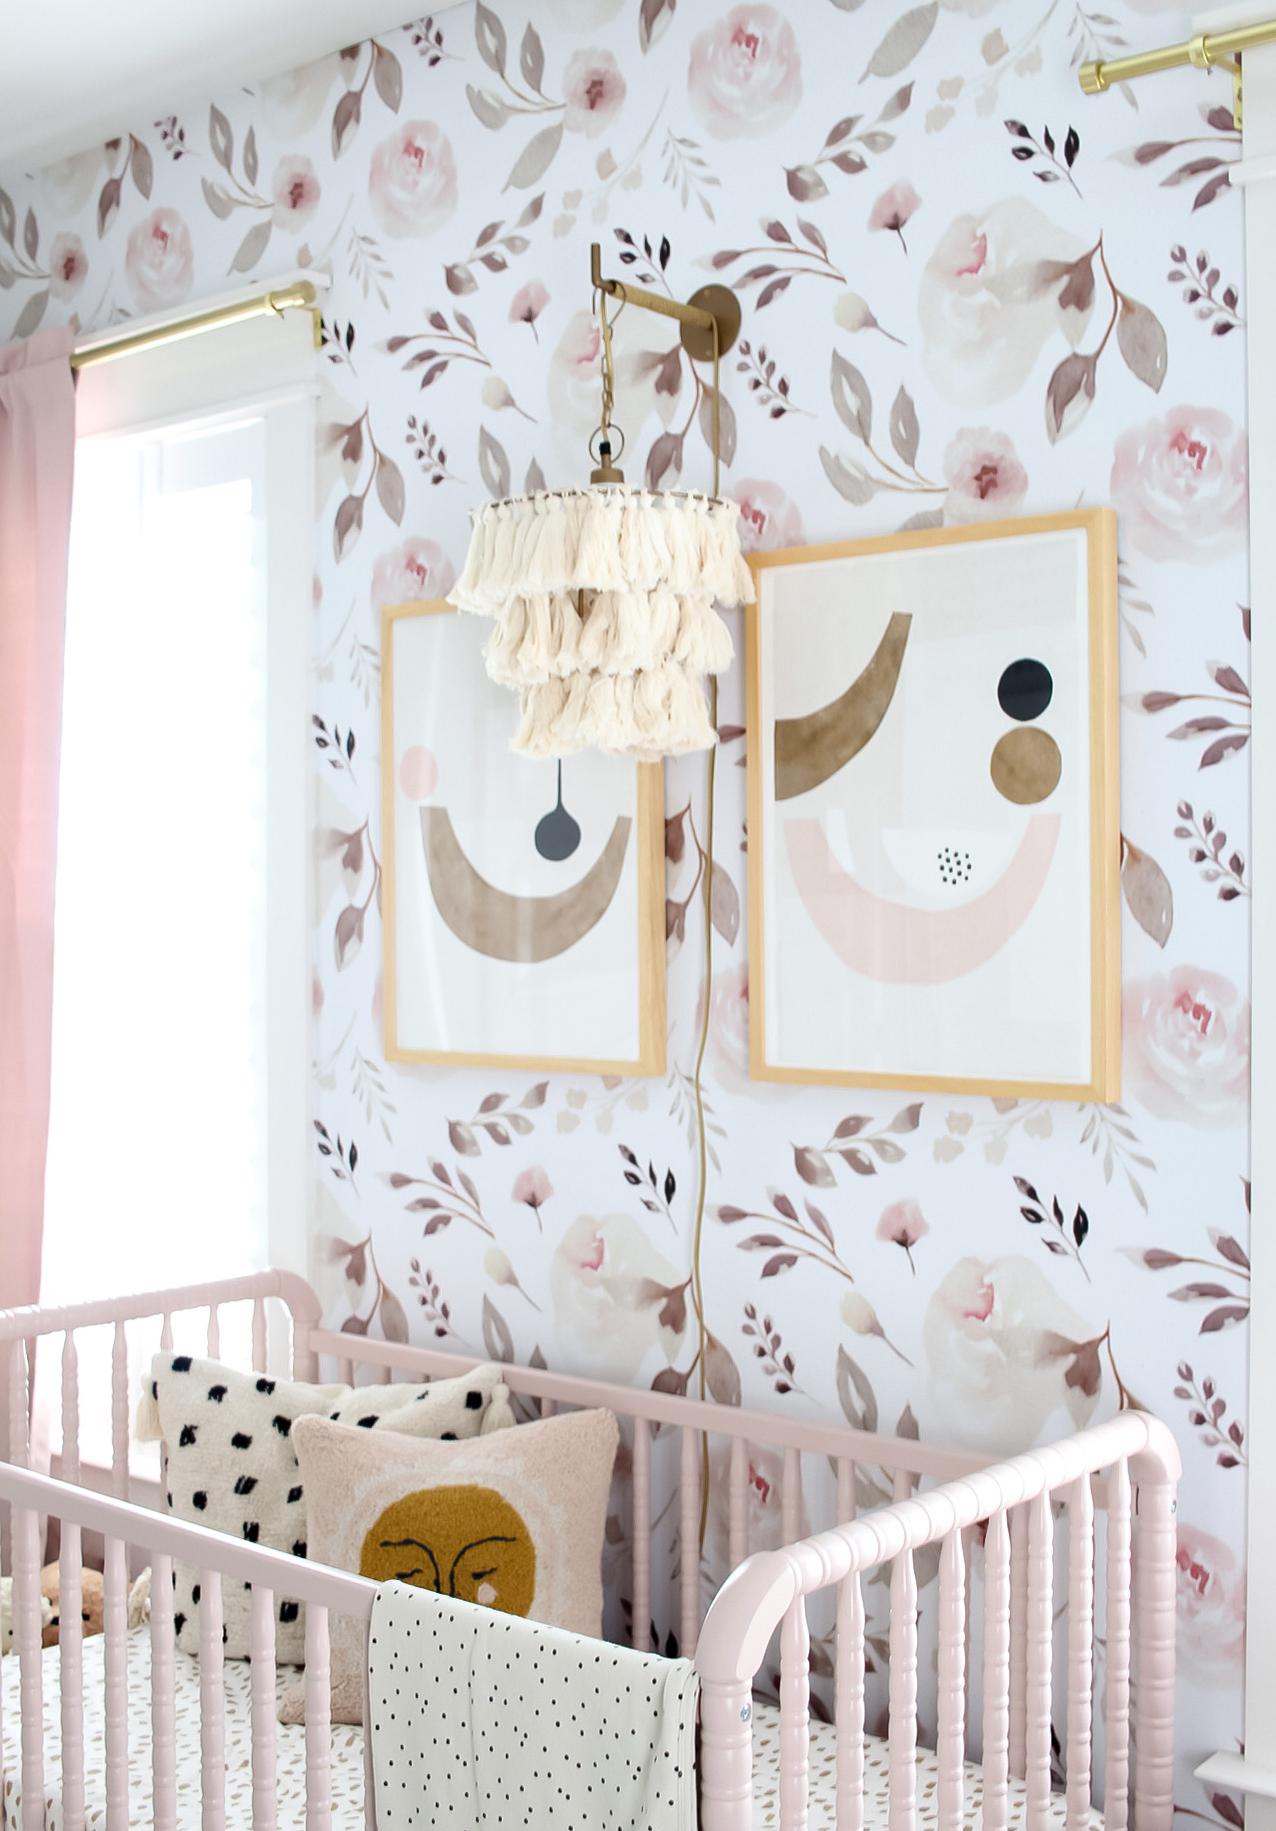 Rose Wallpaper and Tassel Wall Pendant in Baby Girl Nursery